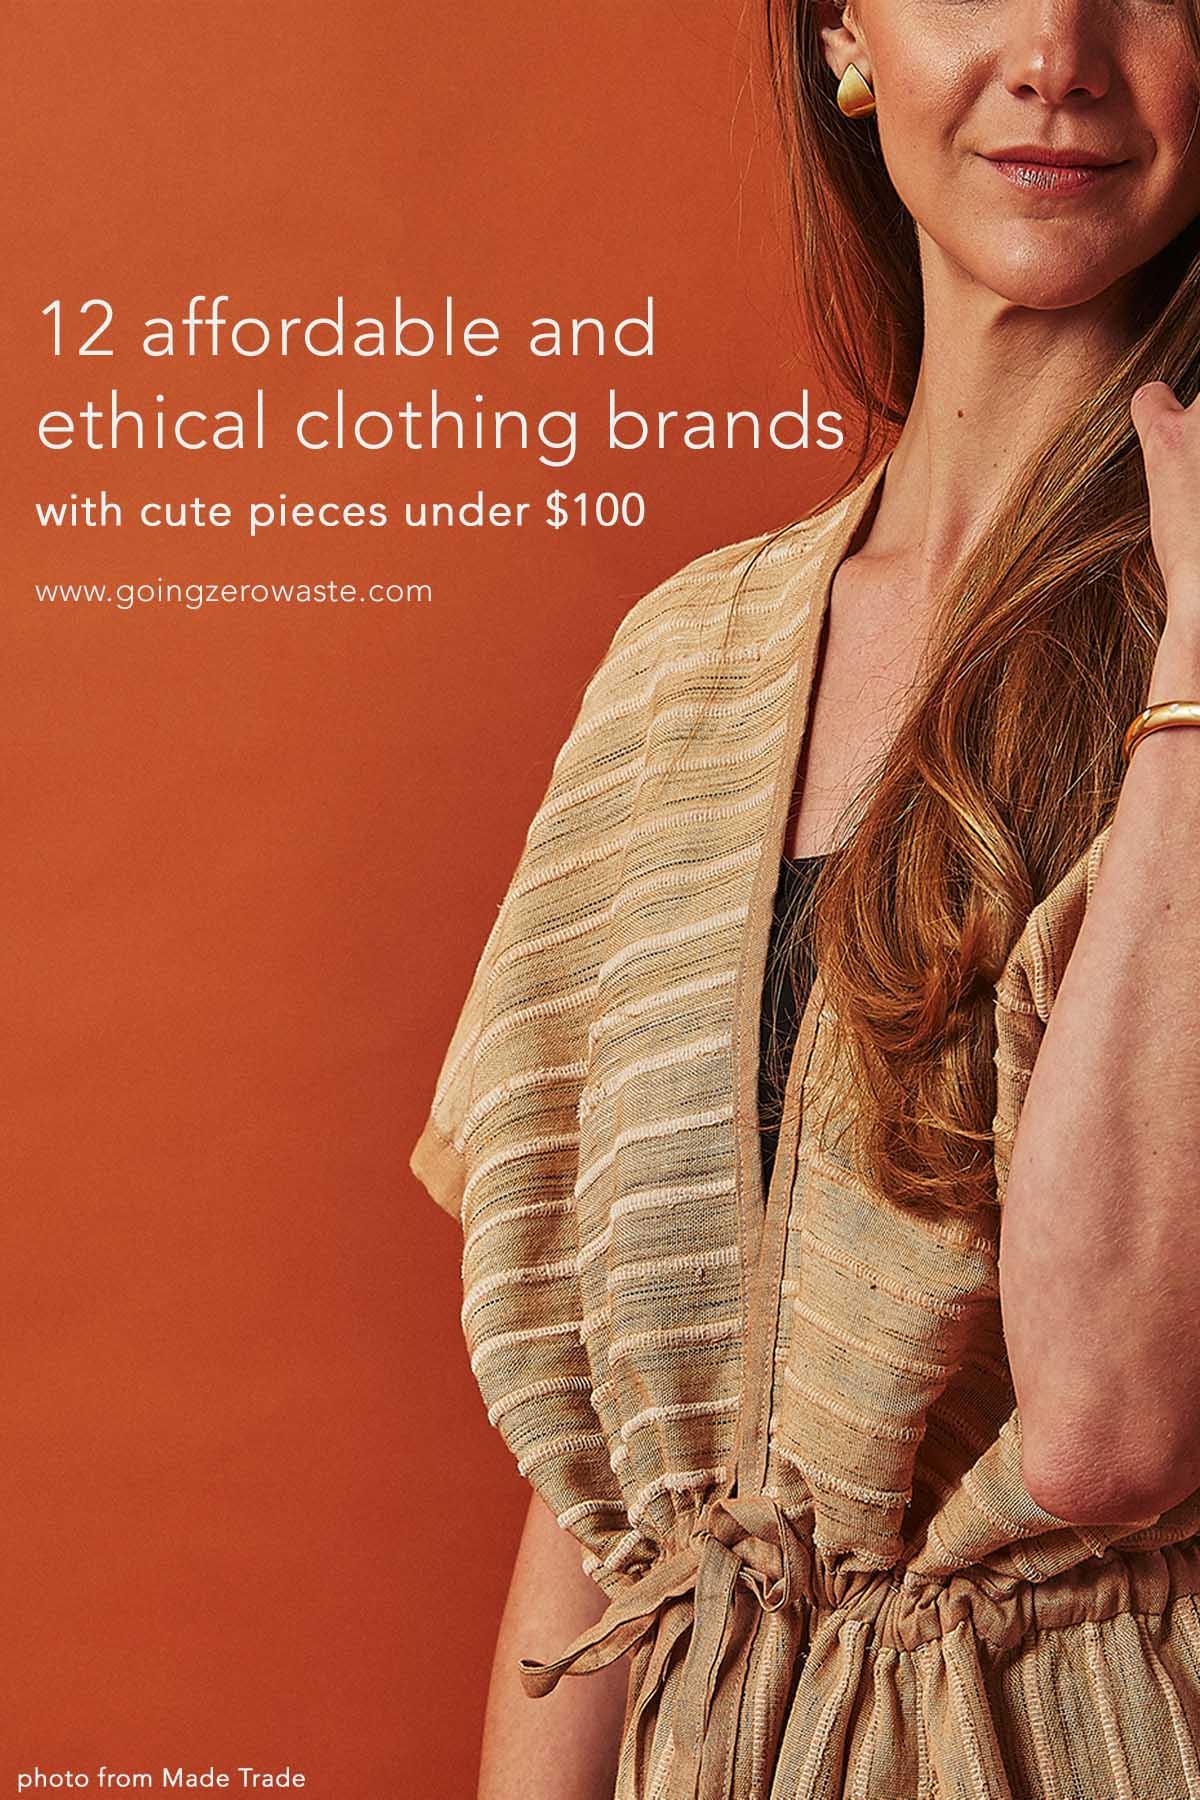 12 Affordable Ethical Clothing Brands from www.goingzerowaste.com #zerowaste #ecofriendly #gogreen #sustainable #sustainablefashion #ethicalfashion #fashion